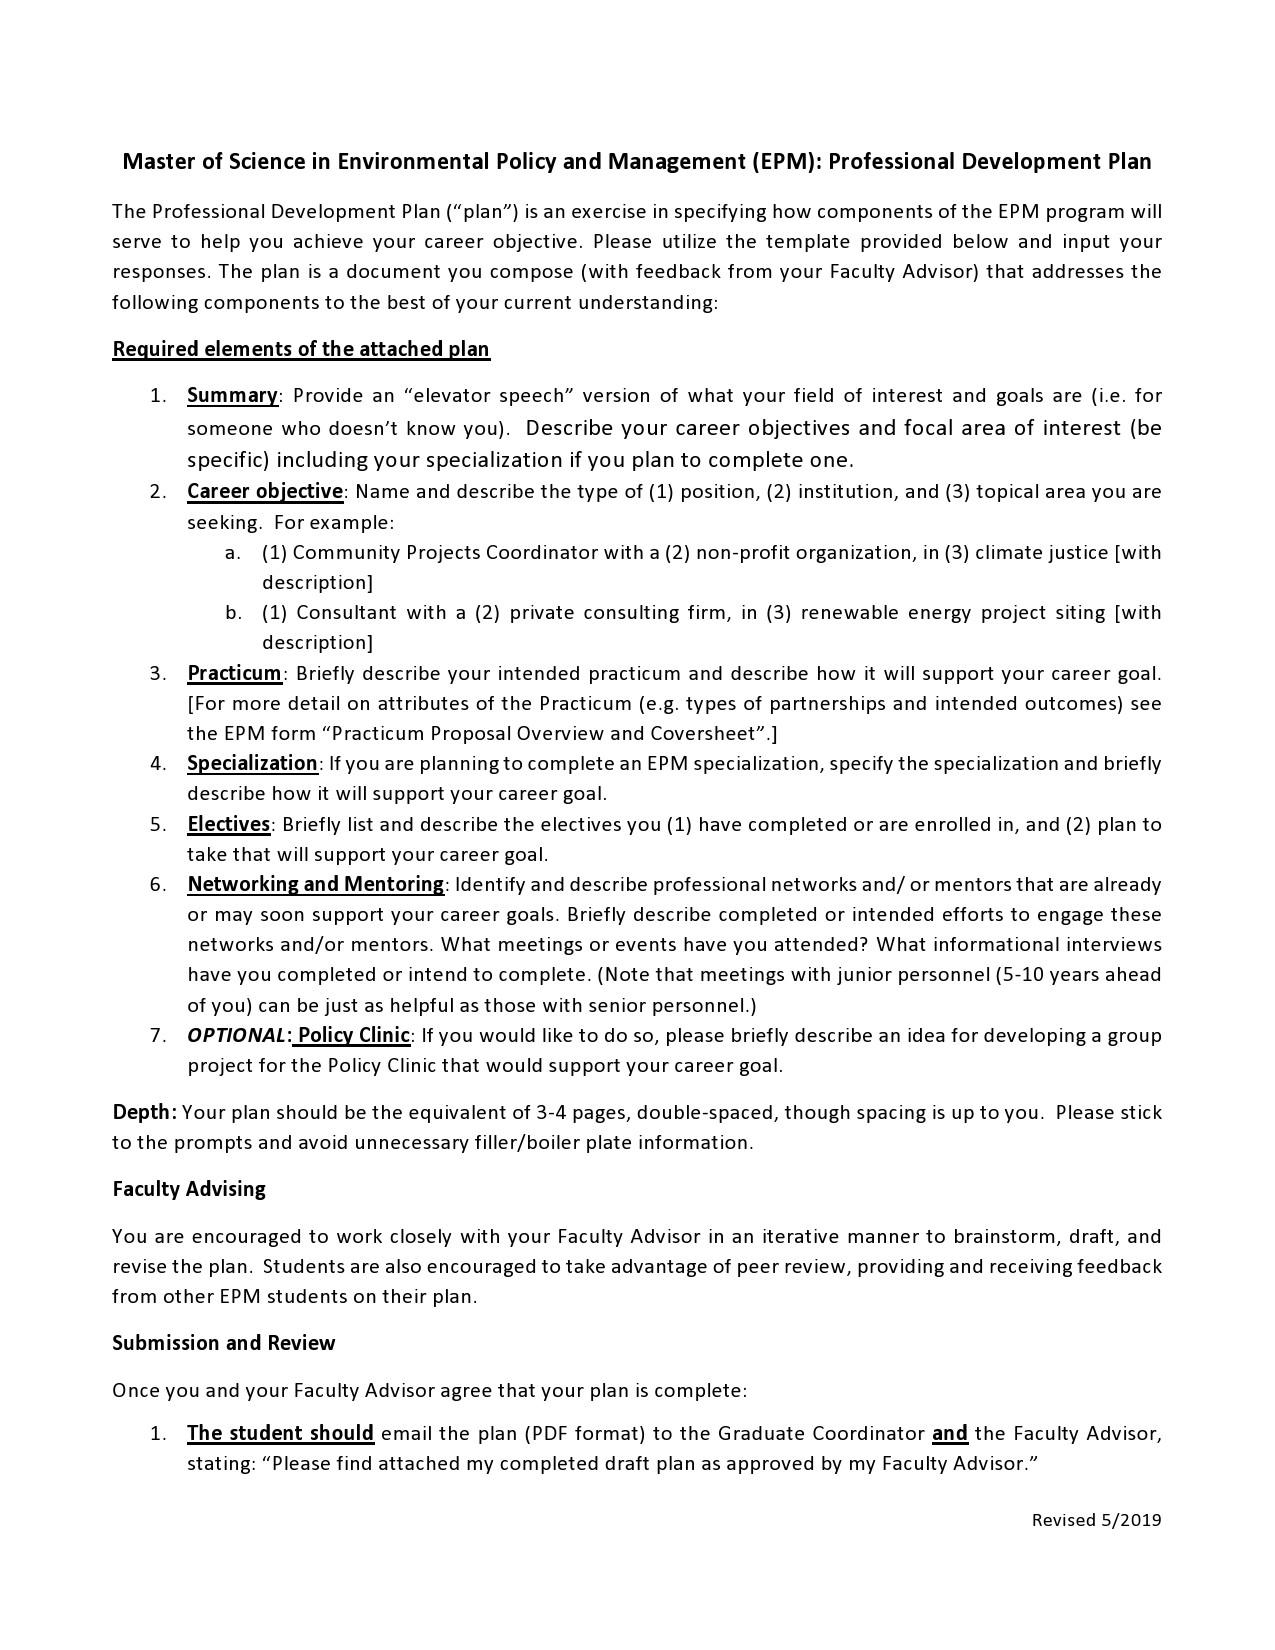 Free professional development plan 45